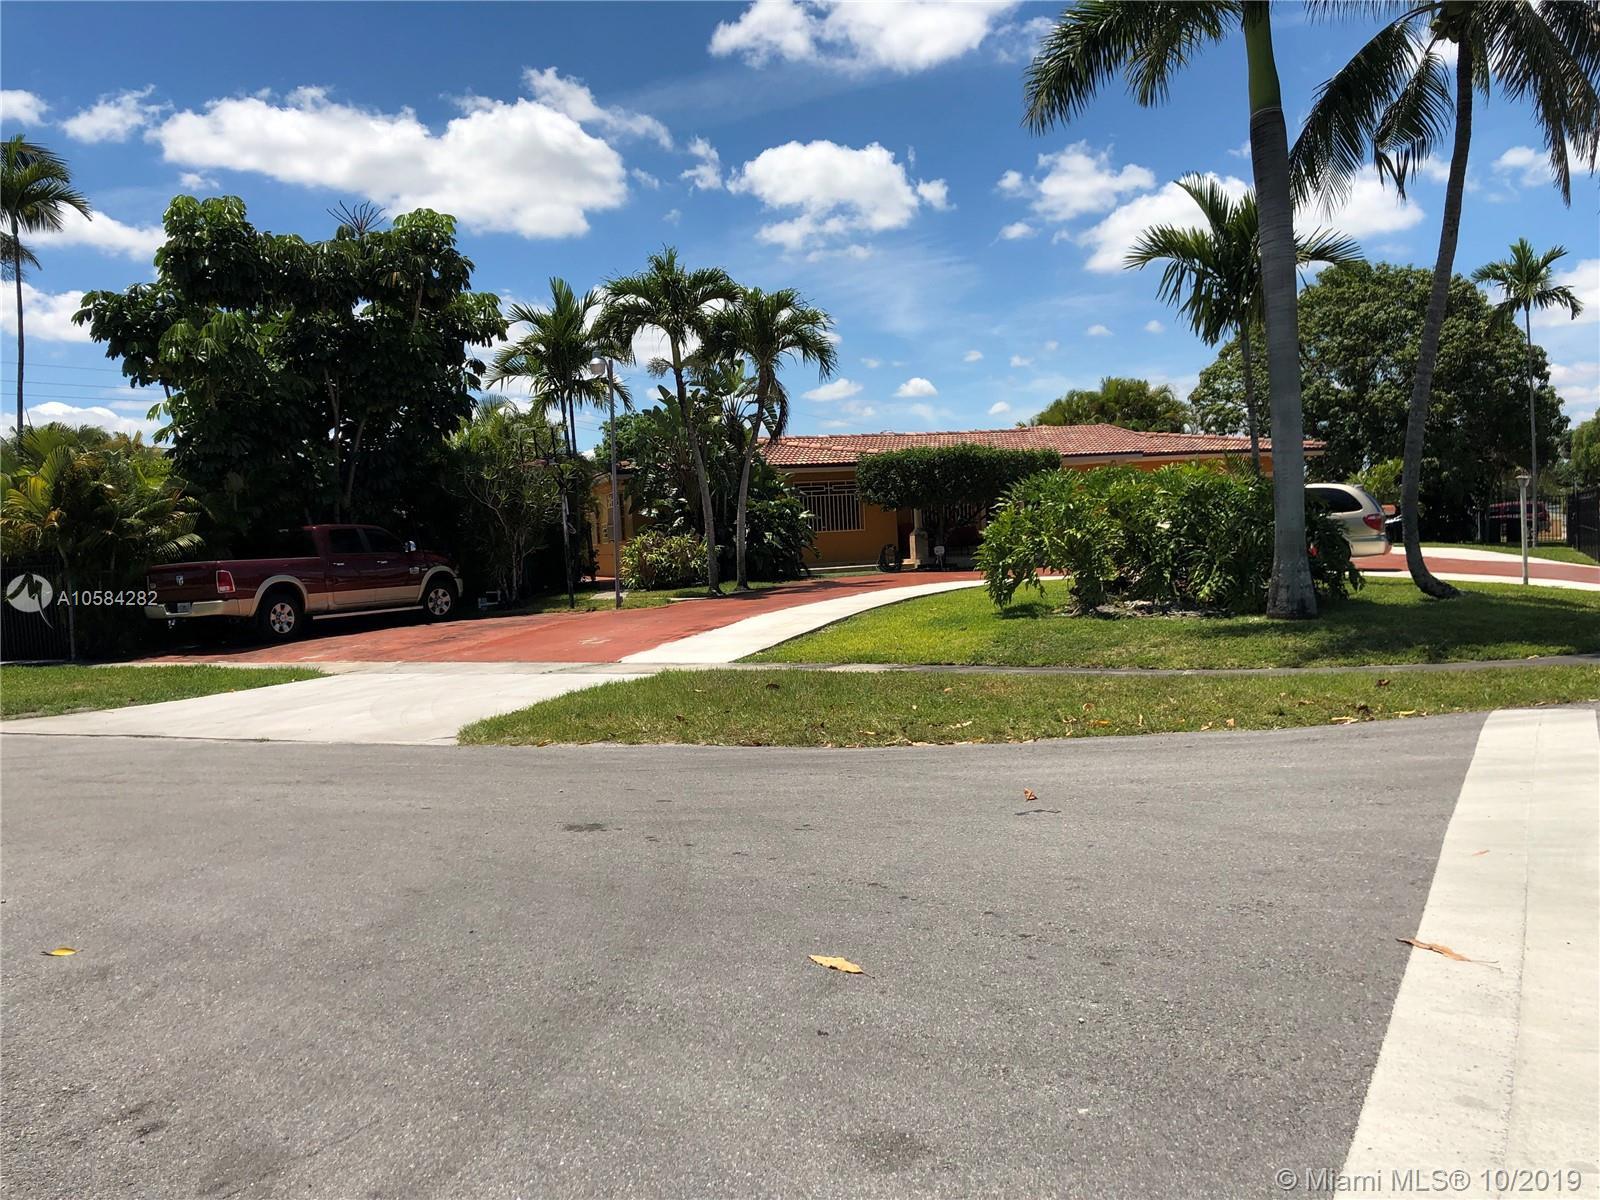 210 W 53rd St Hialeah, FL 33012